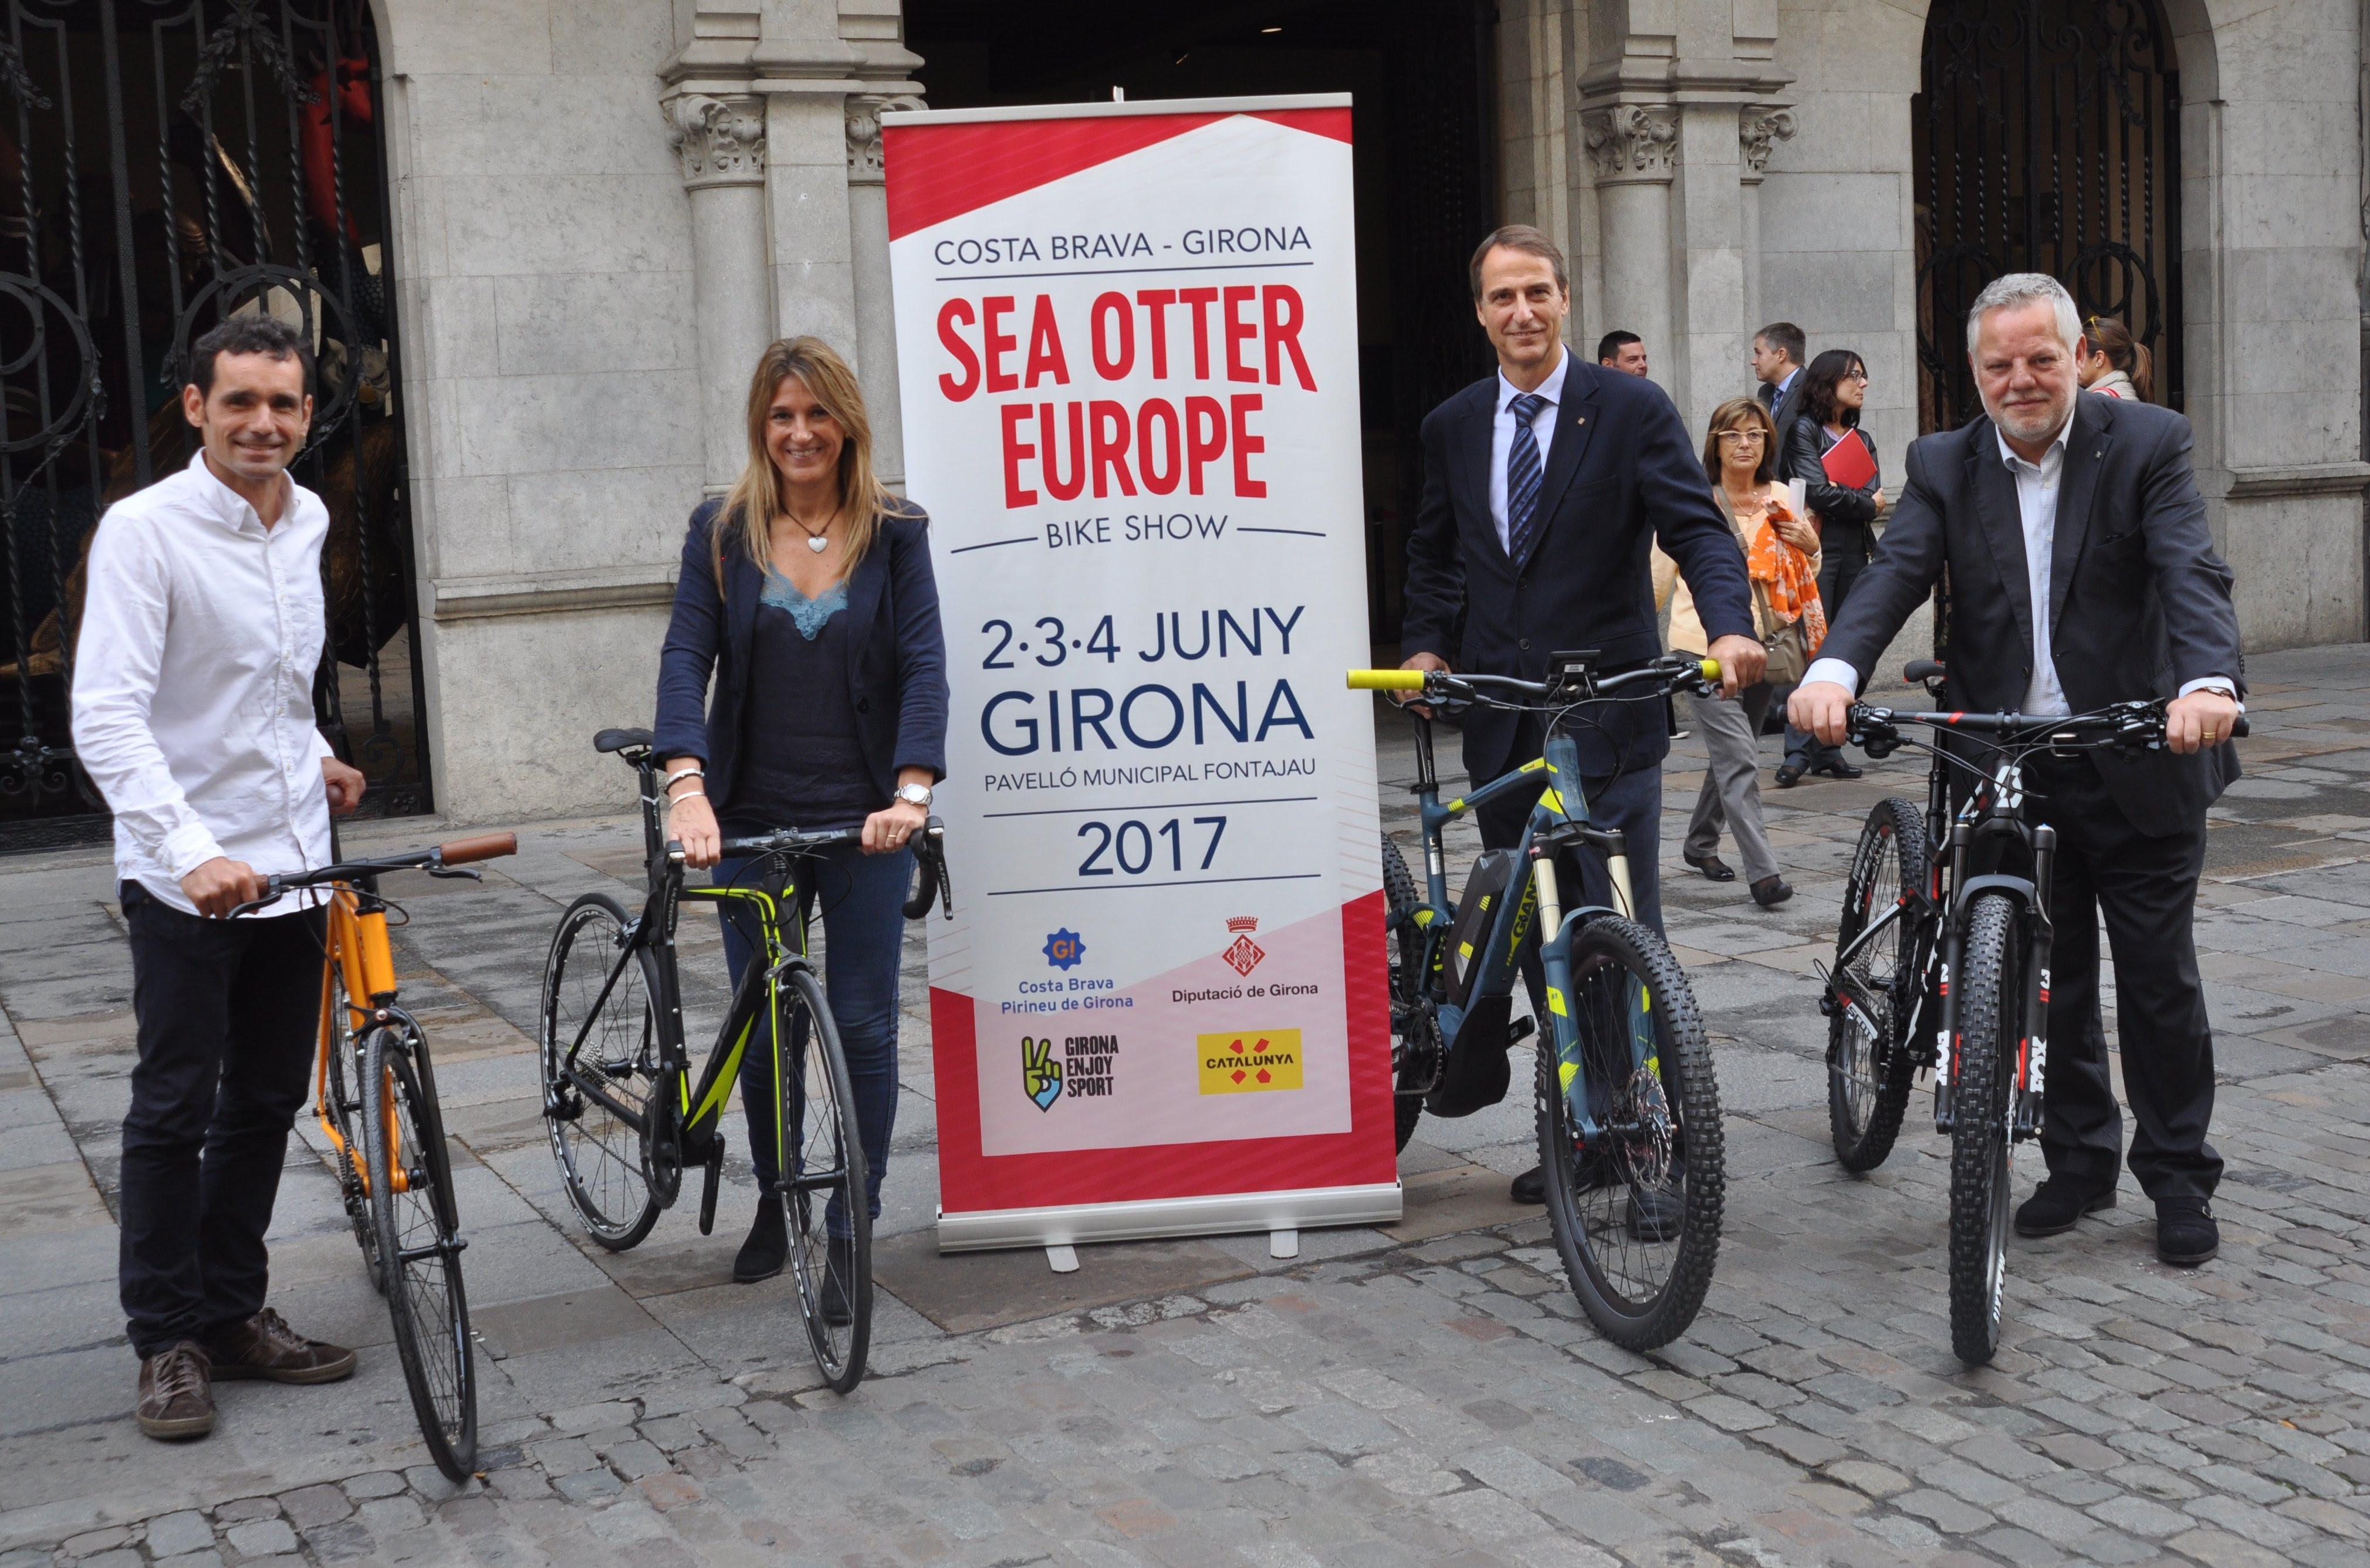 Sea Otter Europe Costa Brava-Girona Bike Show